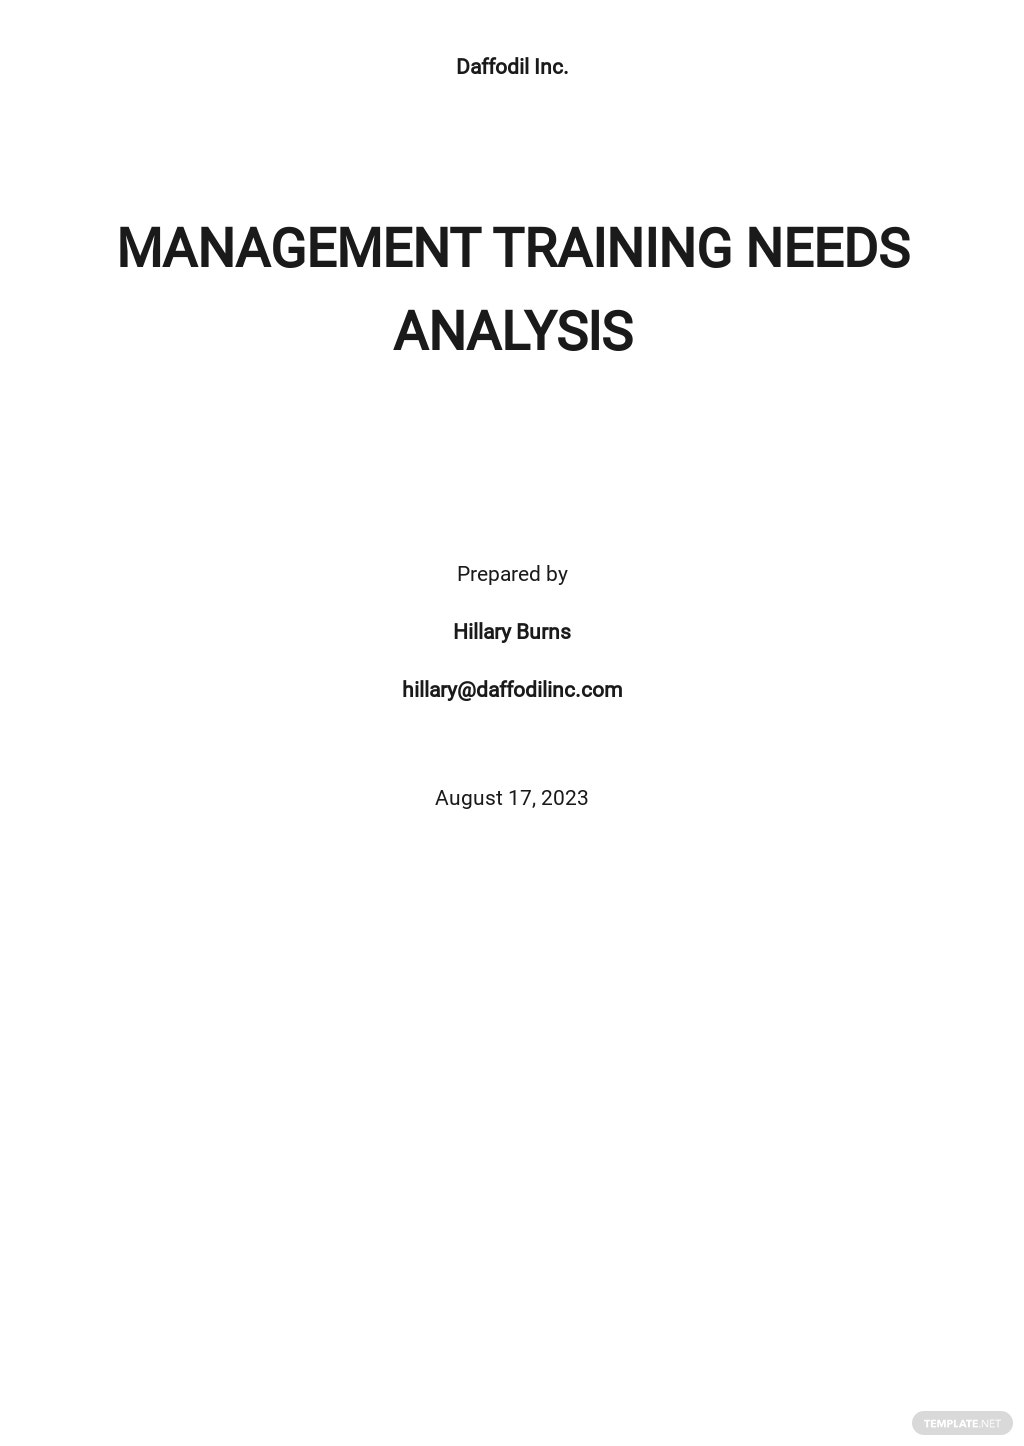 Management Training Needs Analysis Template.jpe